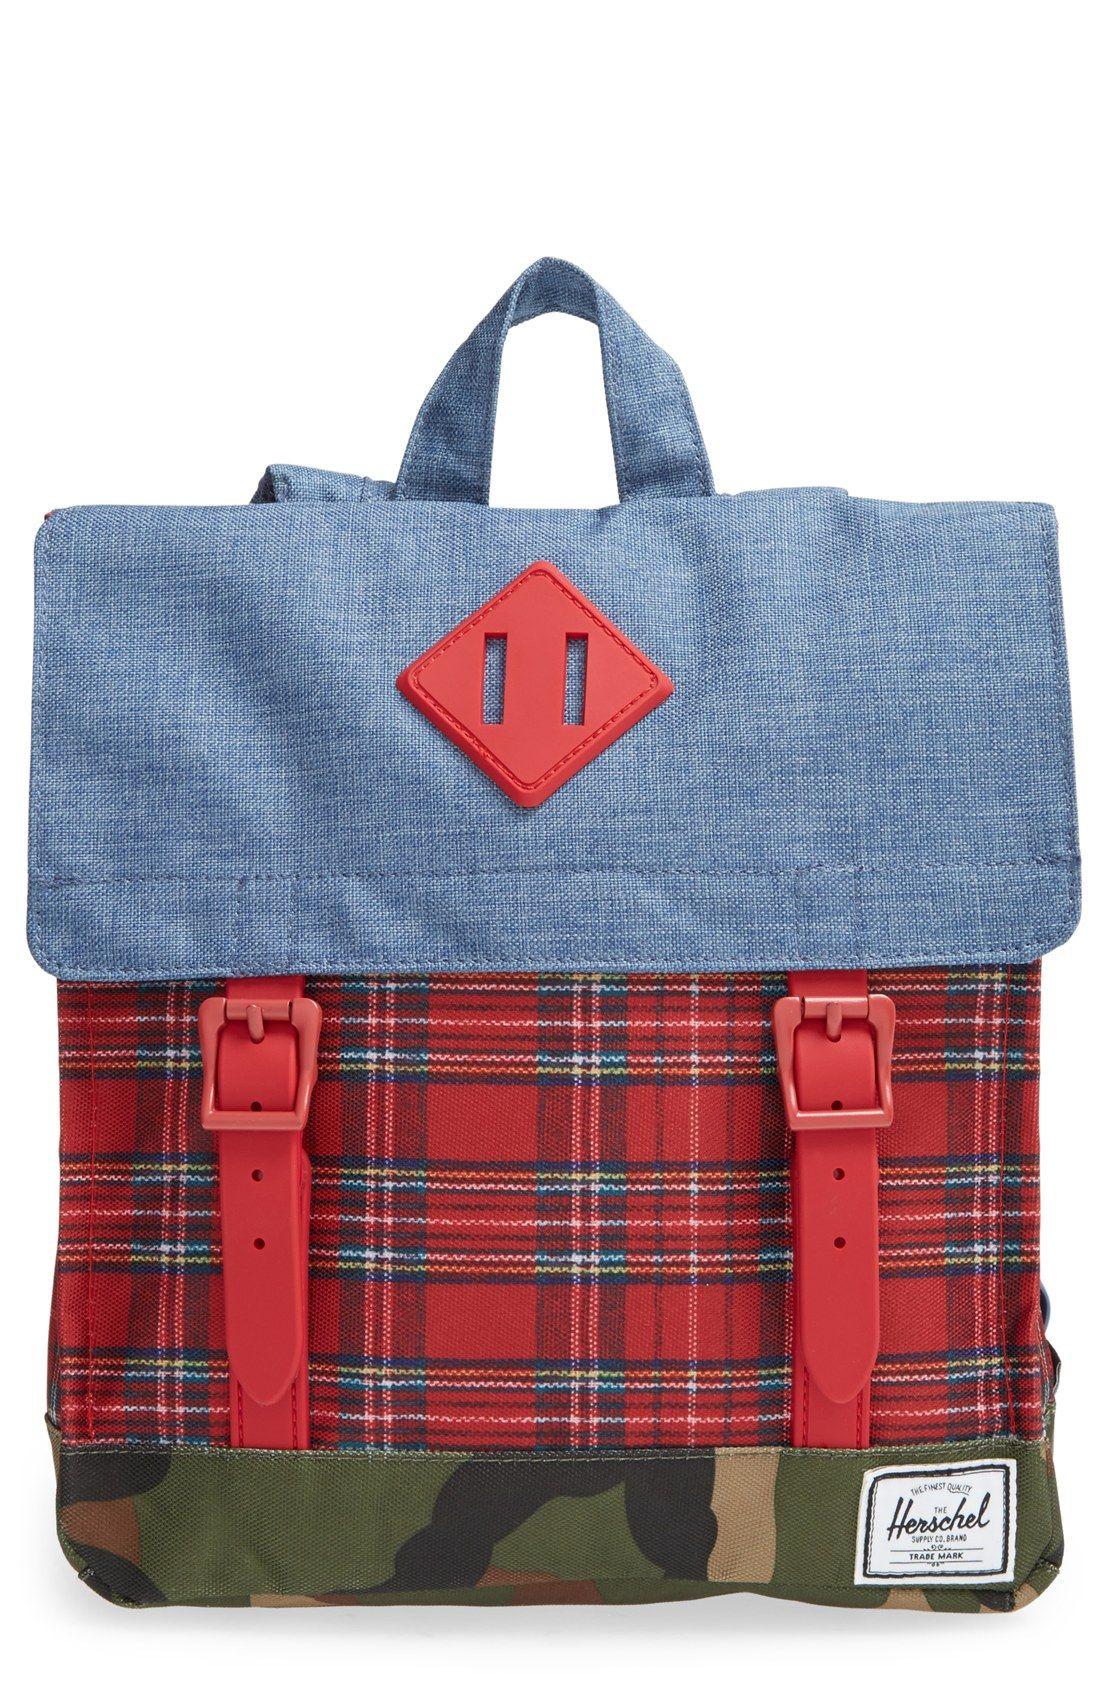 d5e002fdcc8 Herschel Supply Co.  Survey Kid  Scouting Backpack (Kids ...